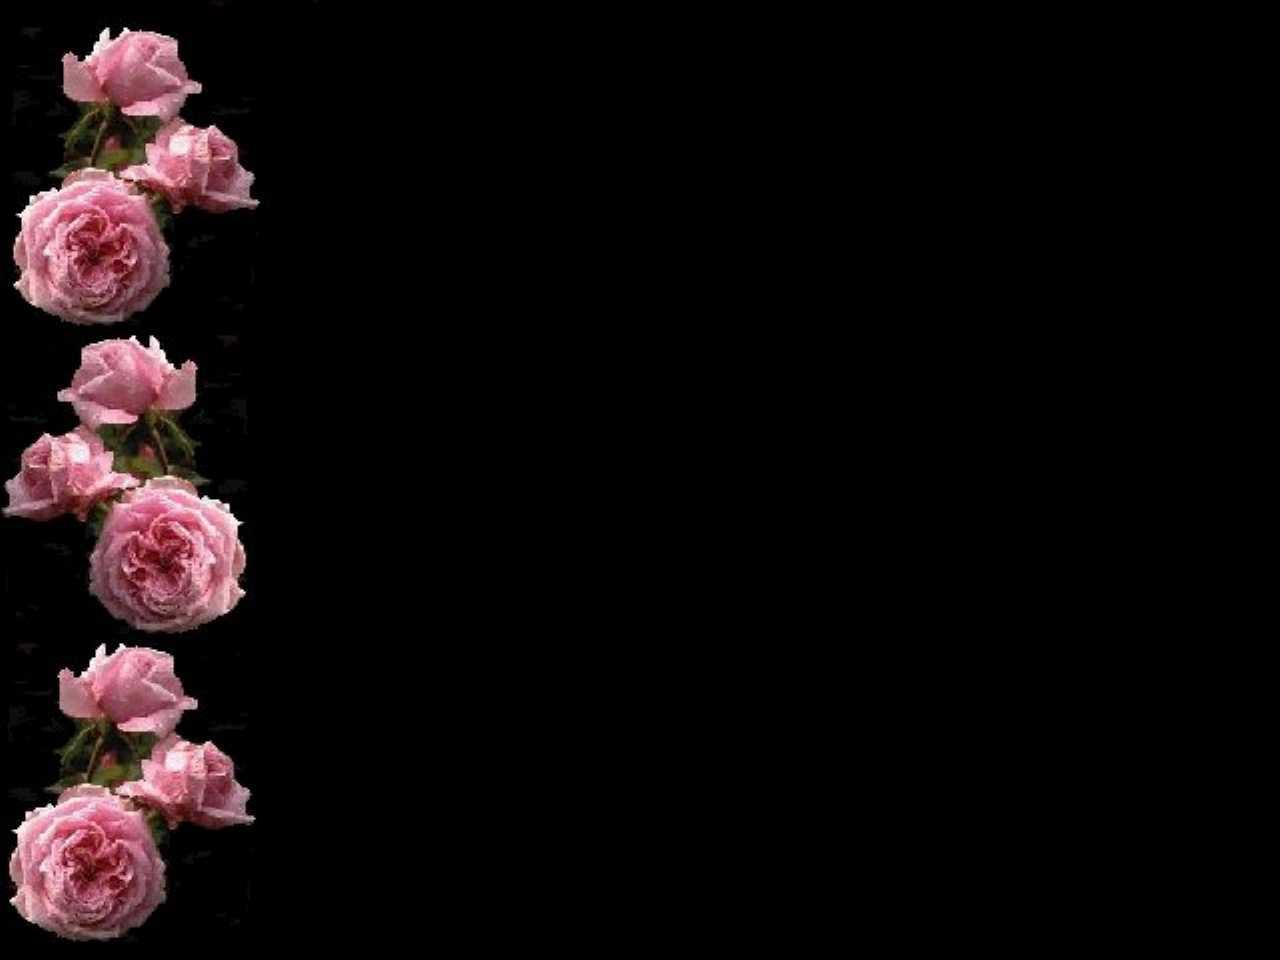 Pink Rose Wallpaper Border HD